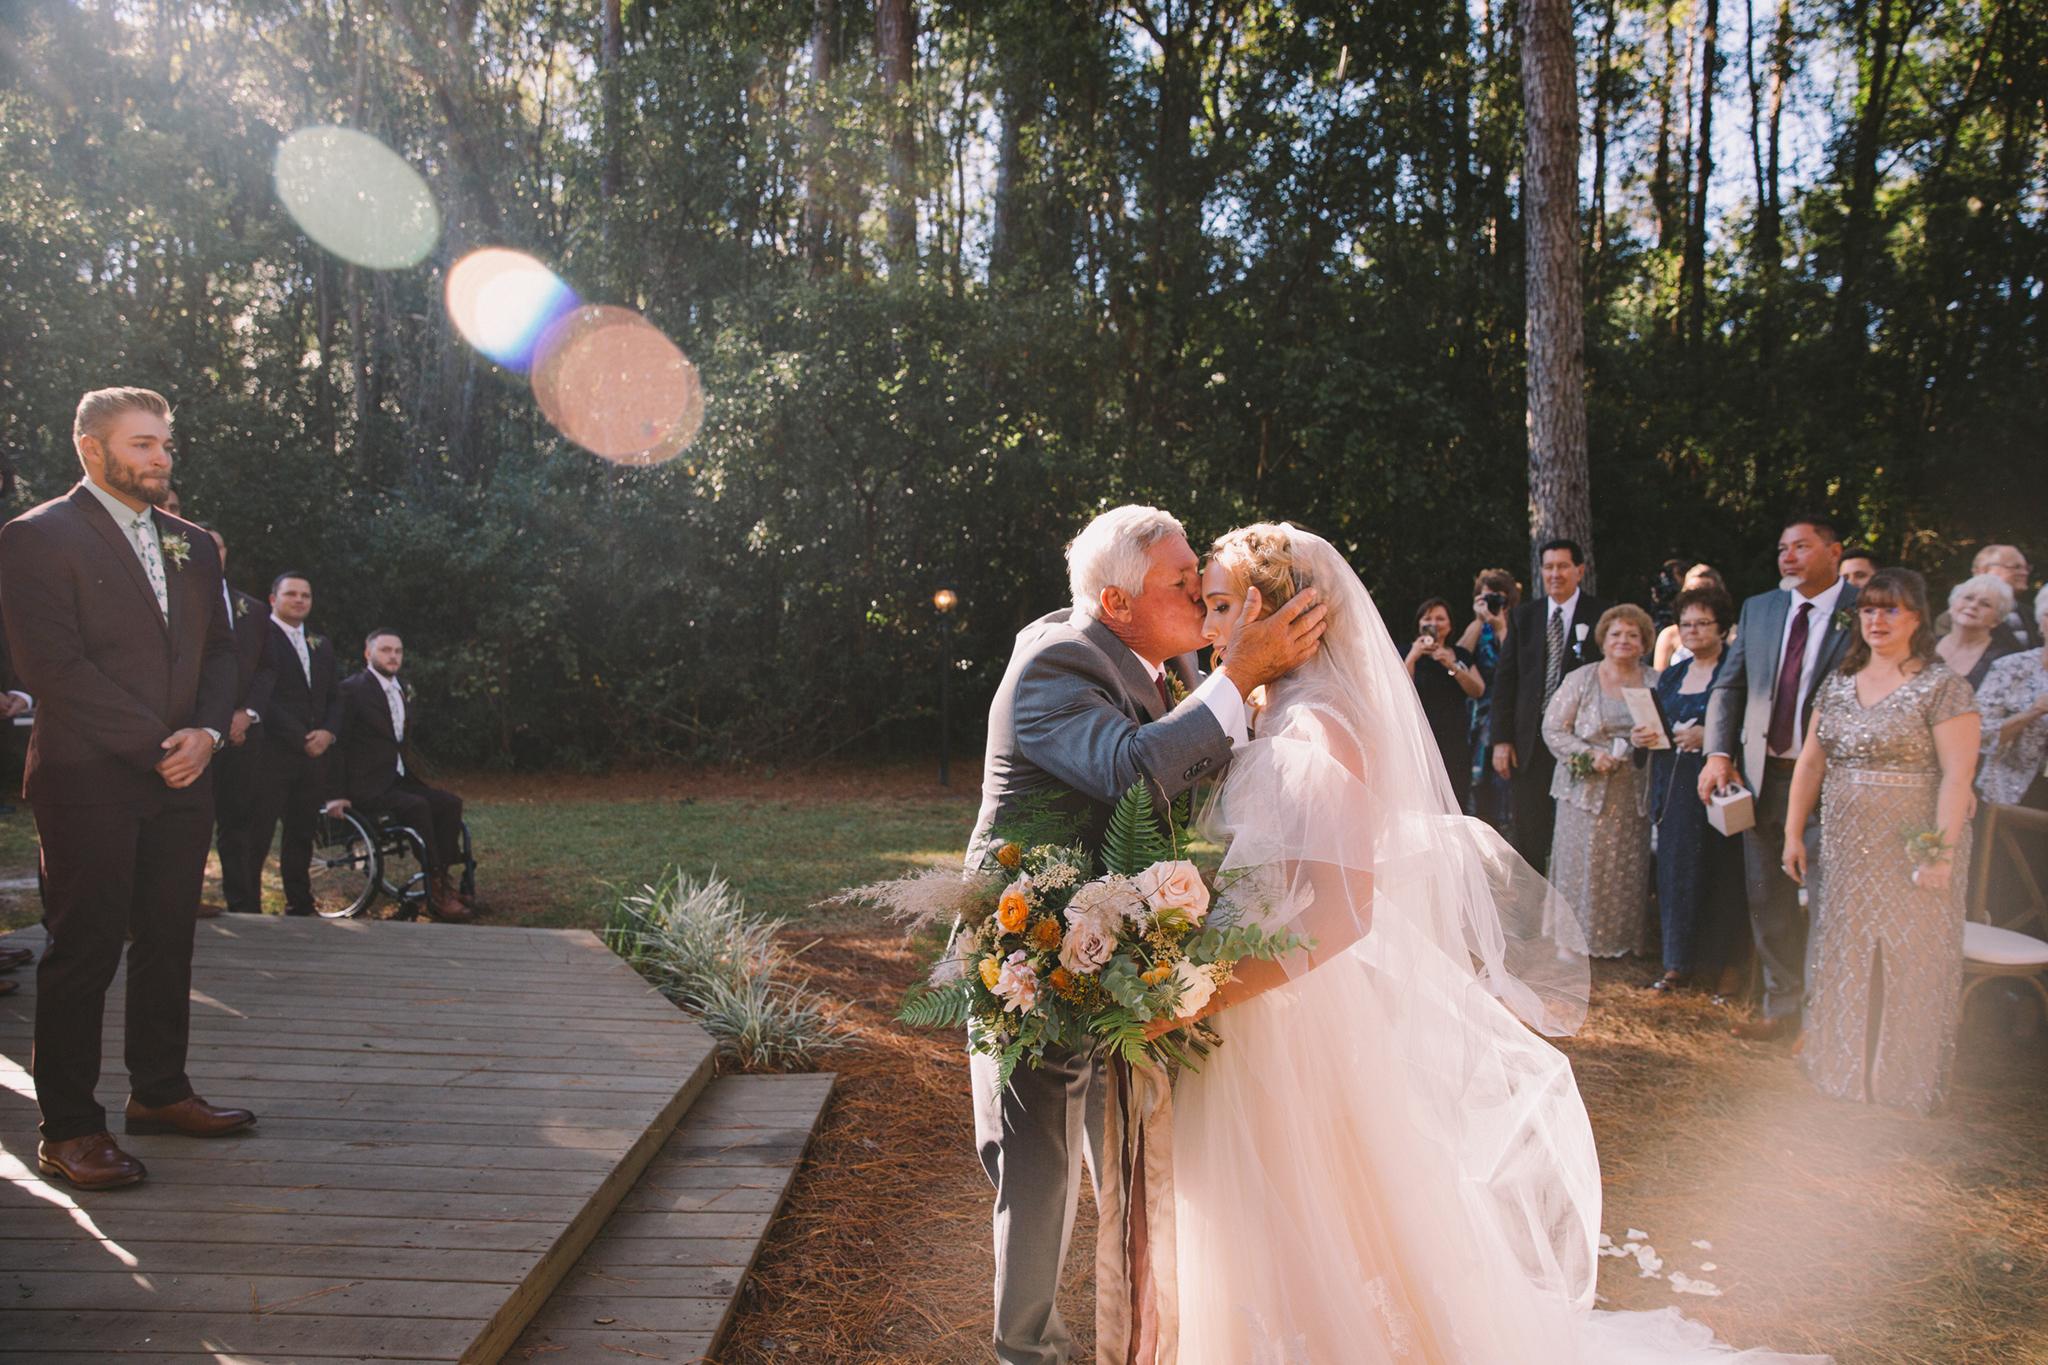 JesseandLex_181103_Alexis_Nate_Wedding_Previews-073.jpg